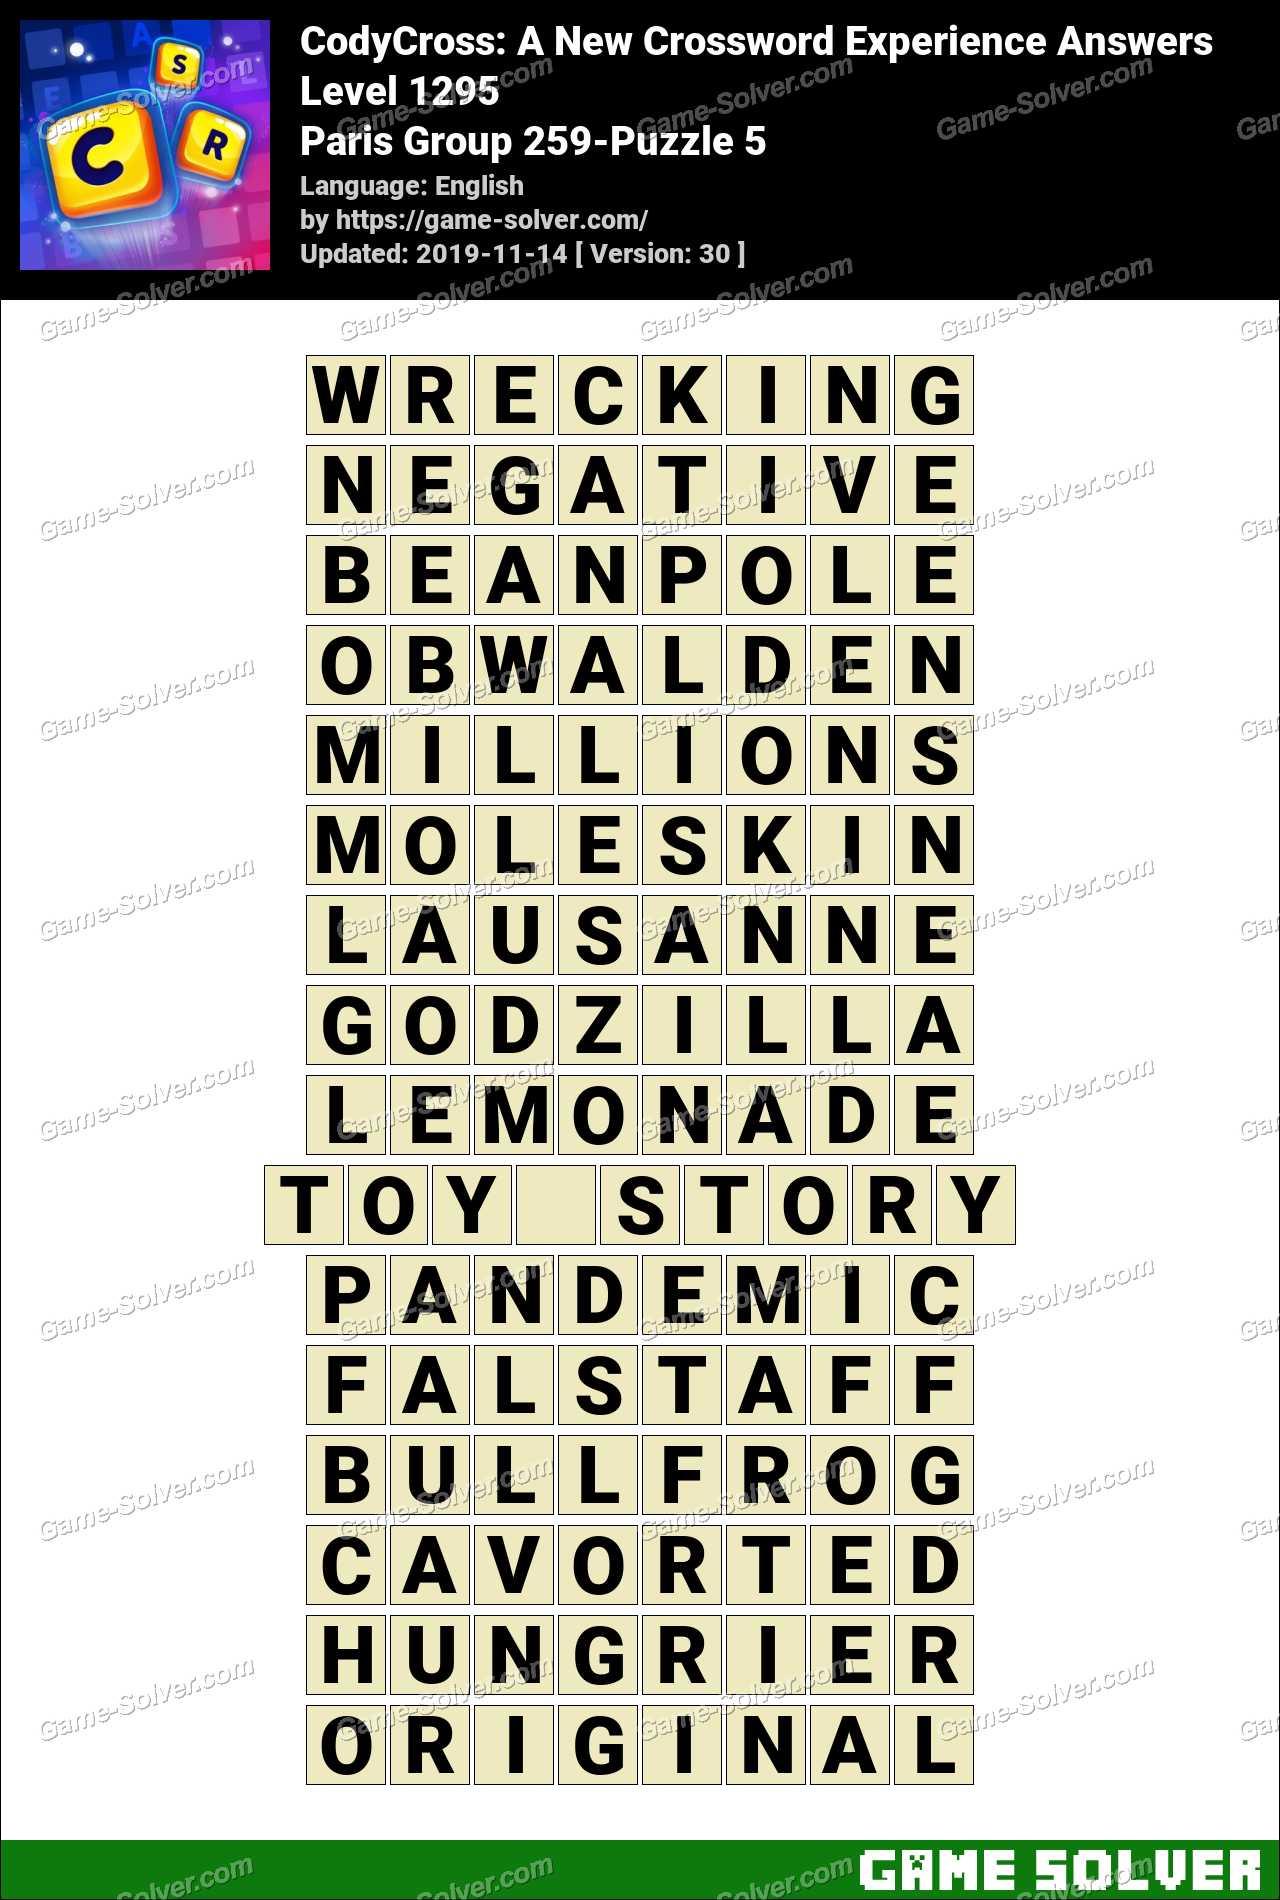 CodyCross Paris Group 259-Puzzle 5 Answers